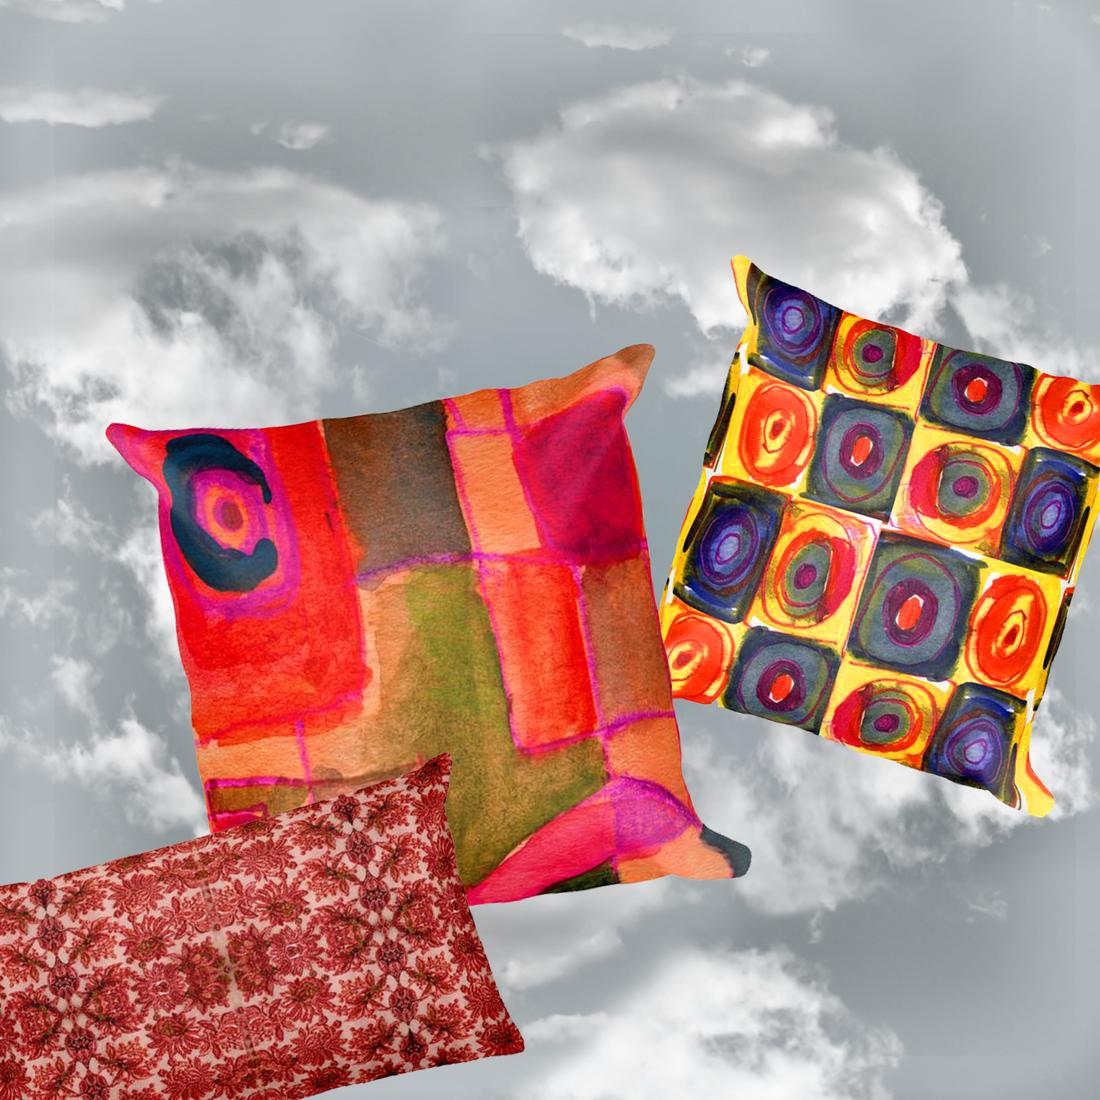 Paris METRO Couture: Original Design Pillow Collection